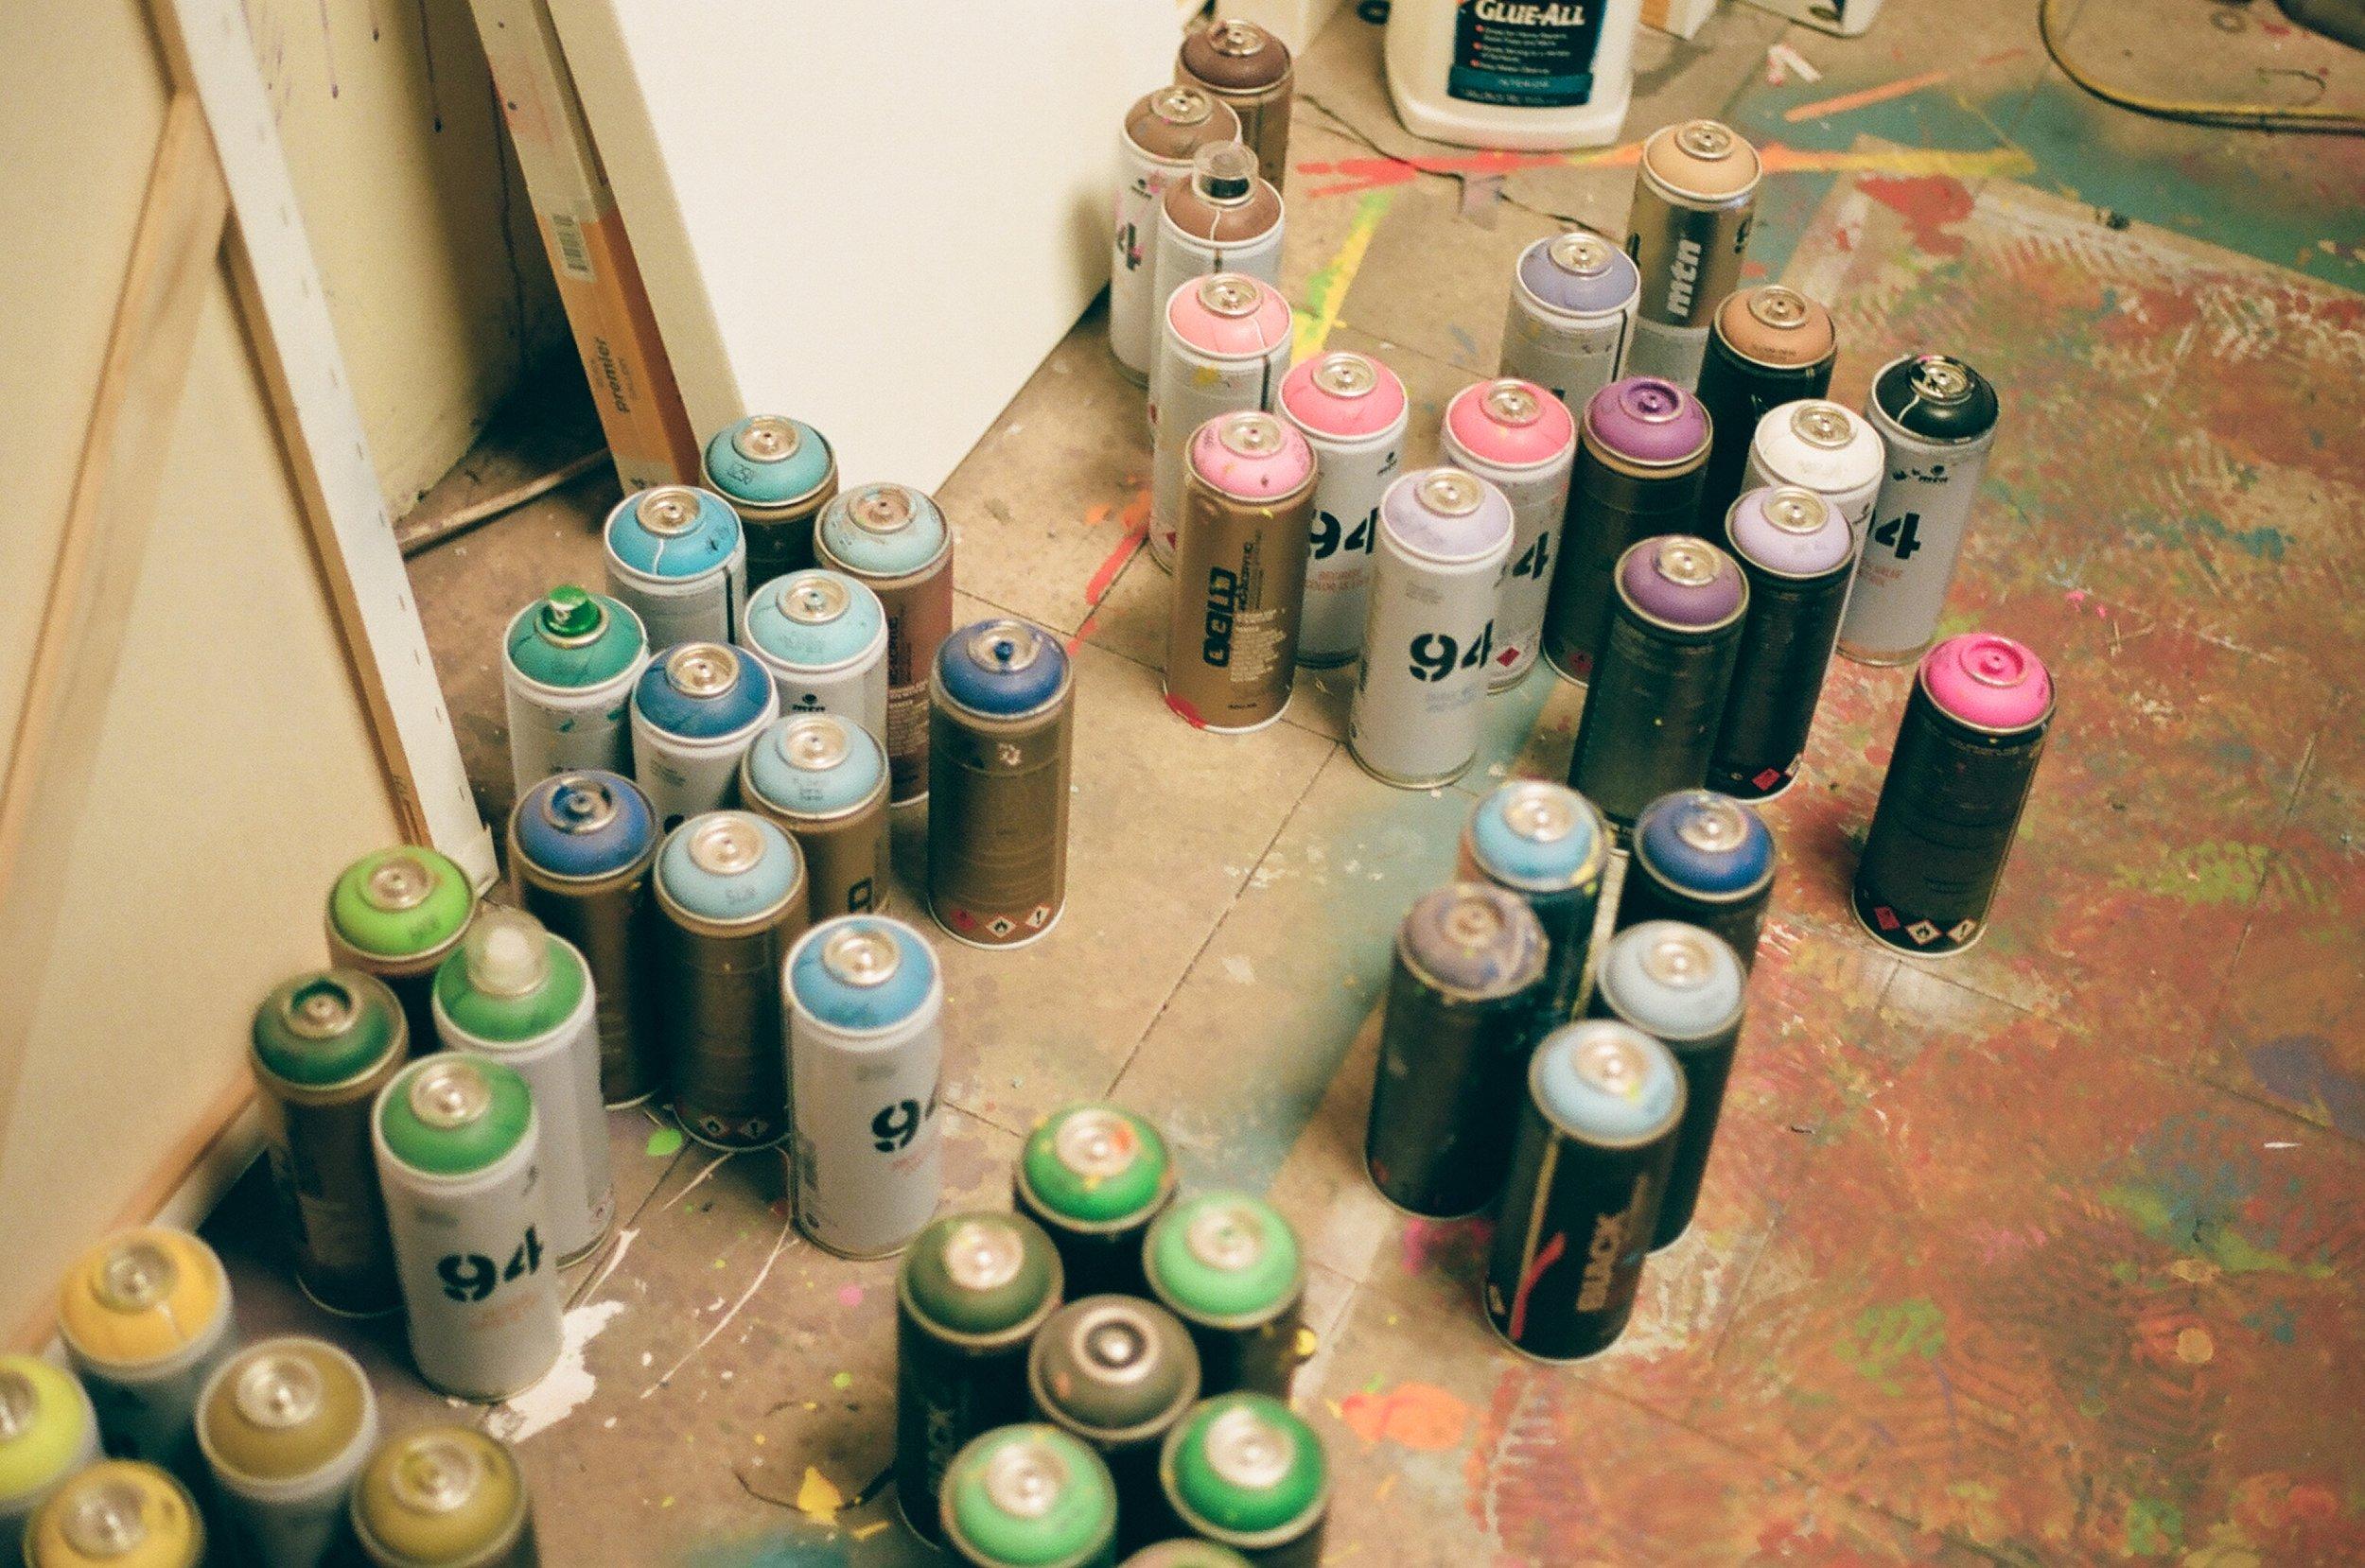 Brandon's assorted spray paints on 35mm